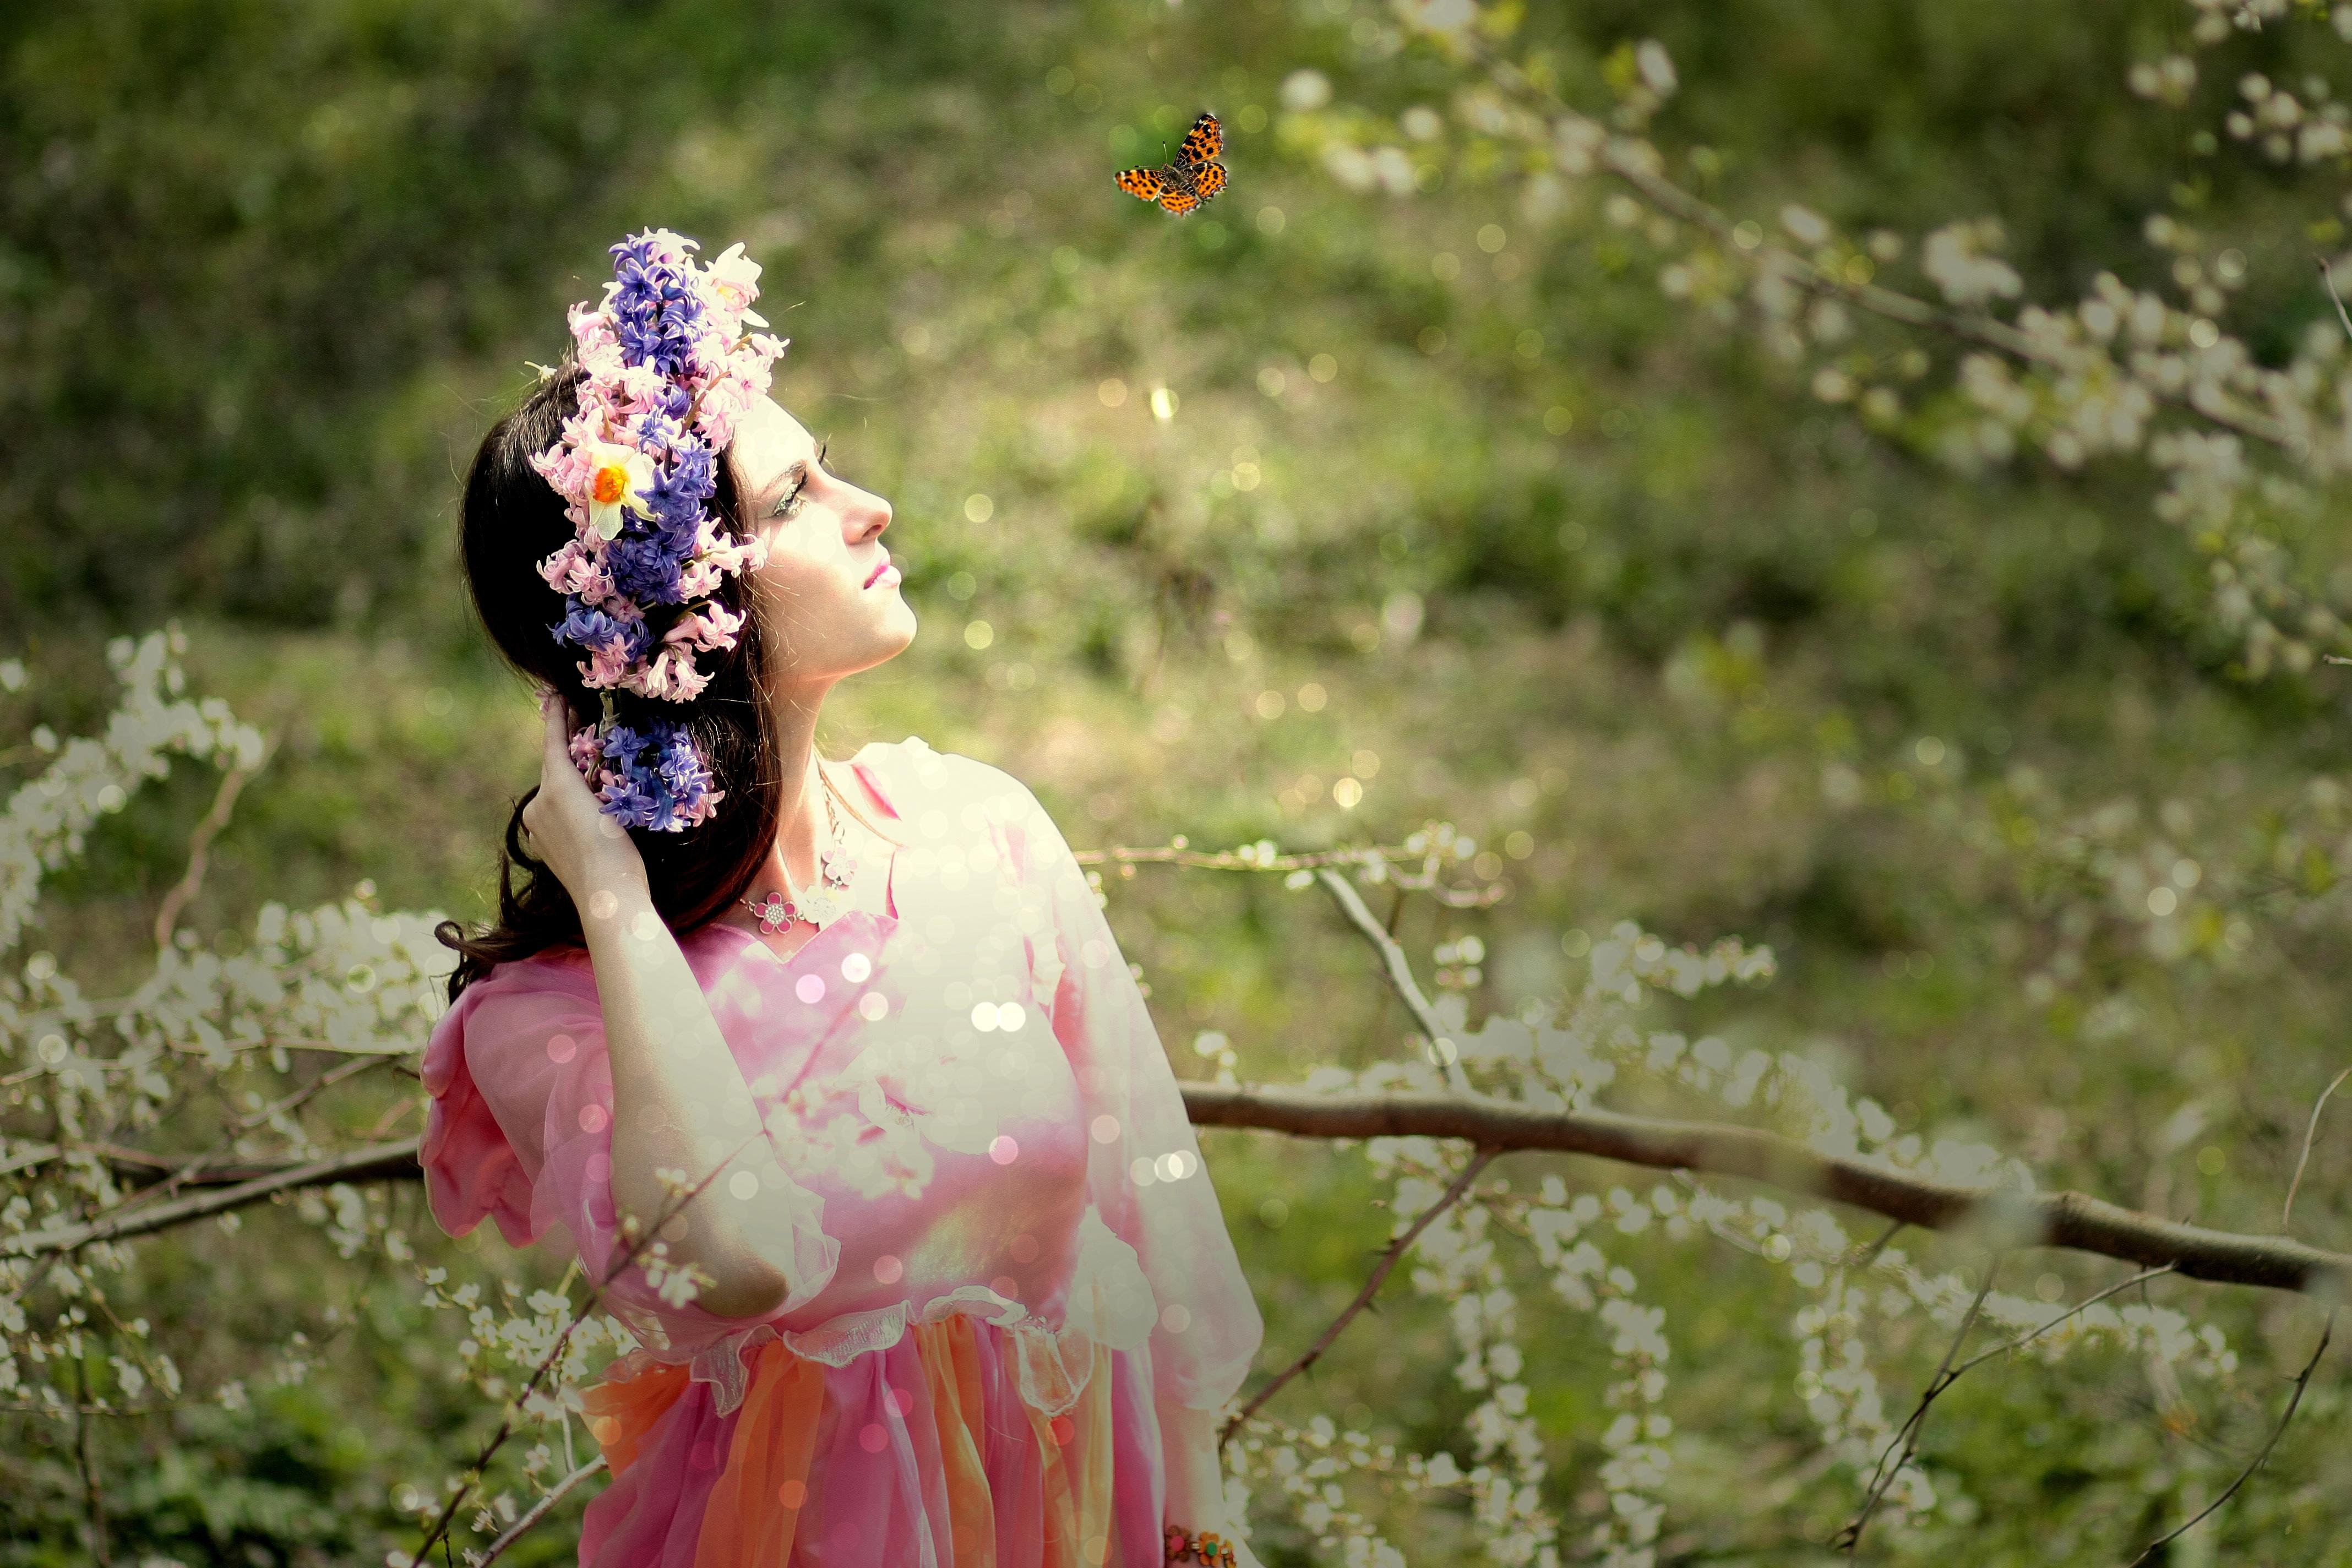 Princess, Beauty, Girl, Portrait, Pose, HQ Photo